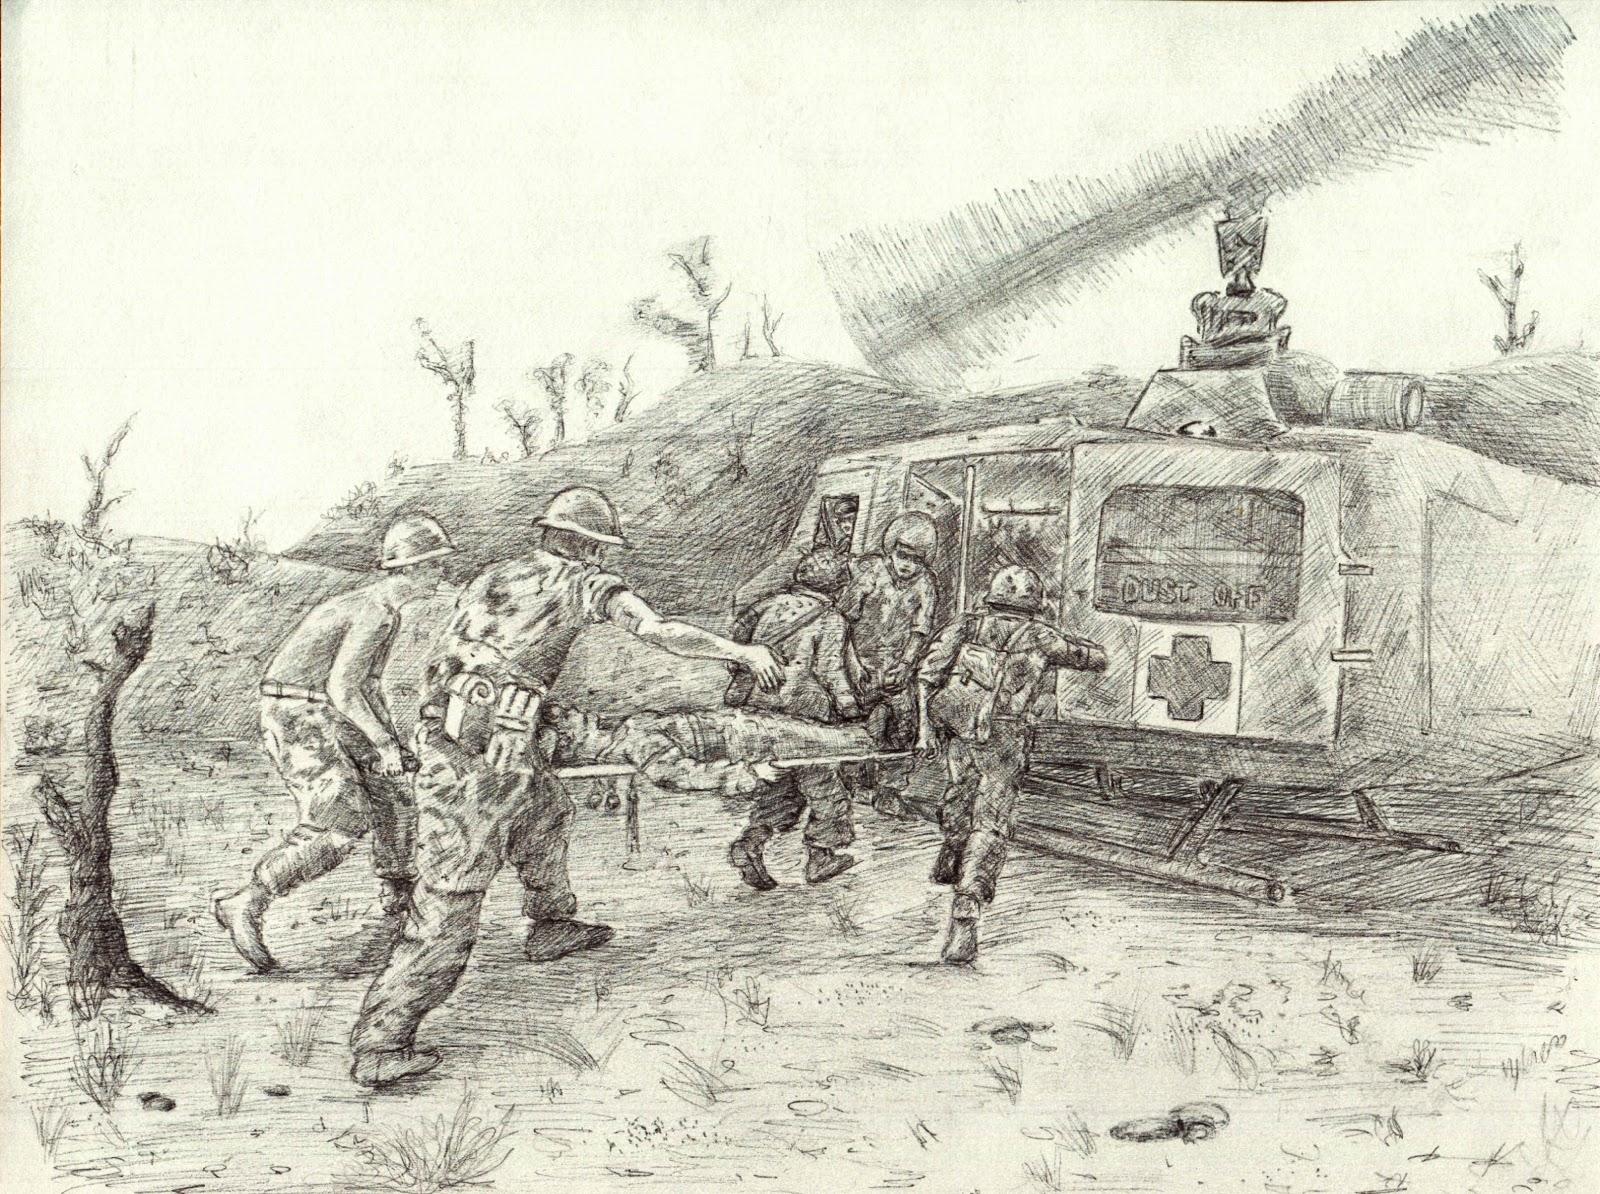 Elliot's Illustration: Final war medic drawings.